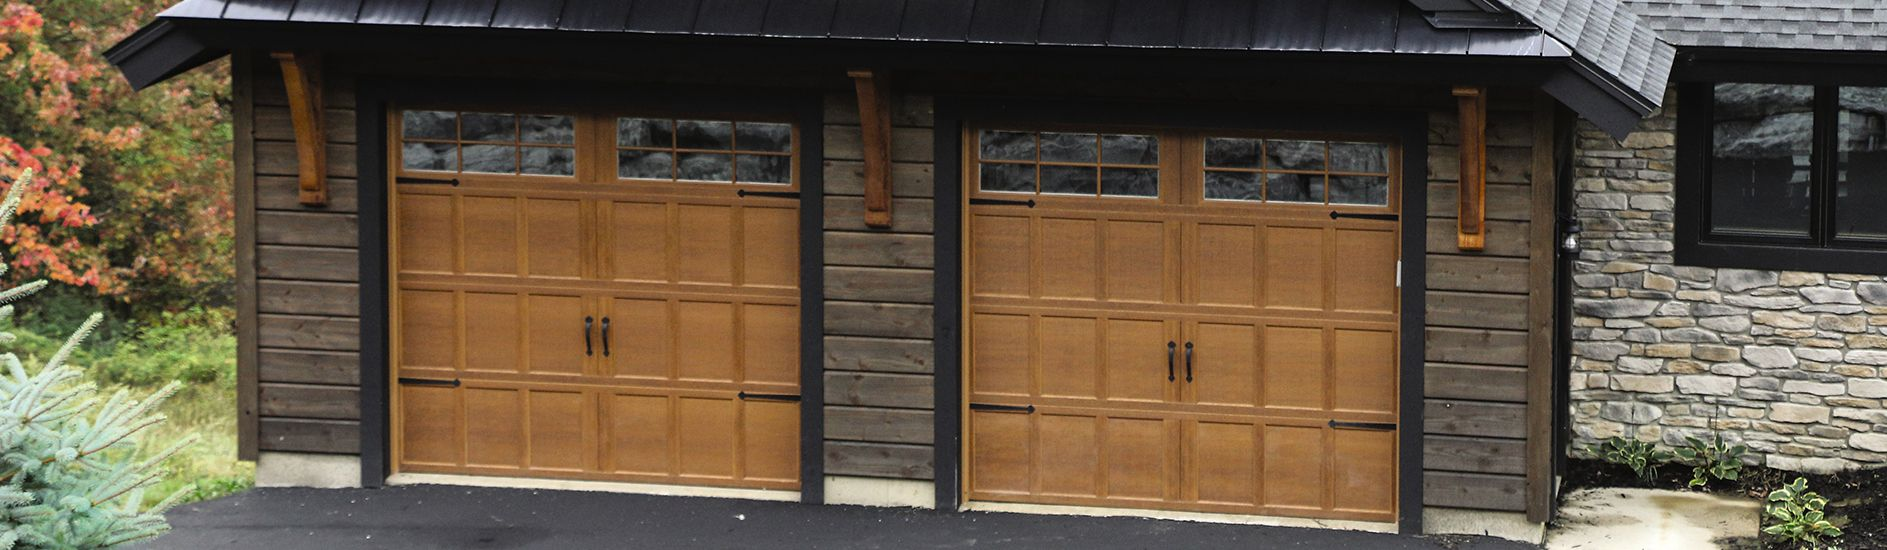 insulated garage doors Garage doors, Garage door